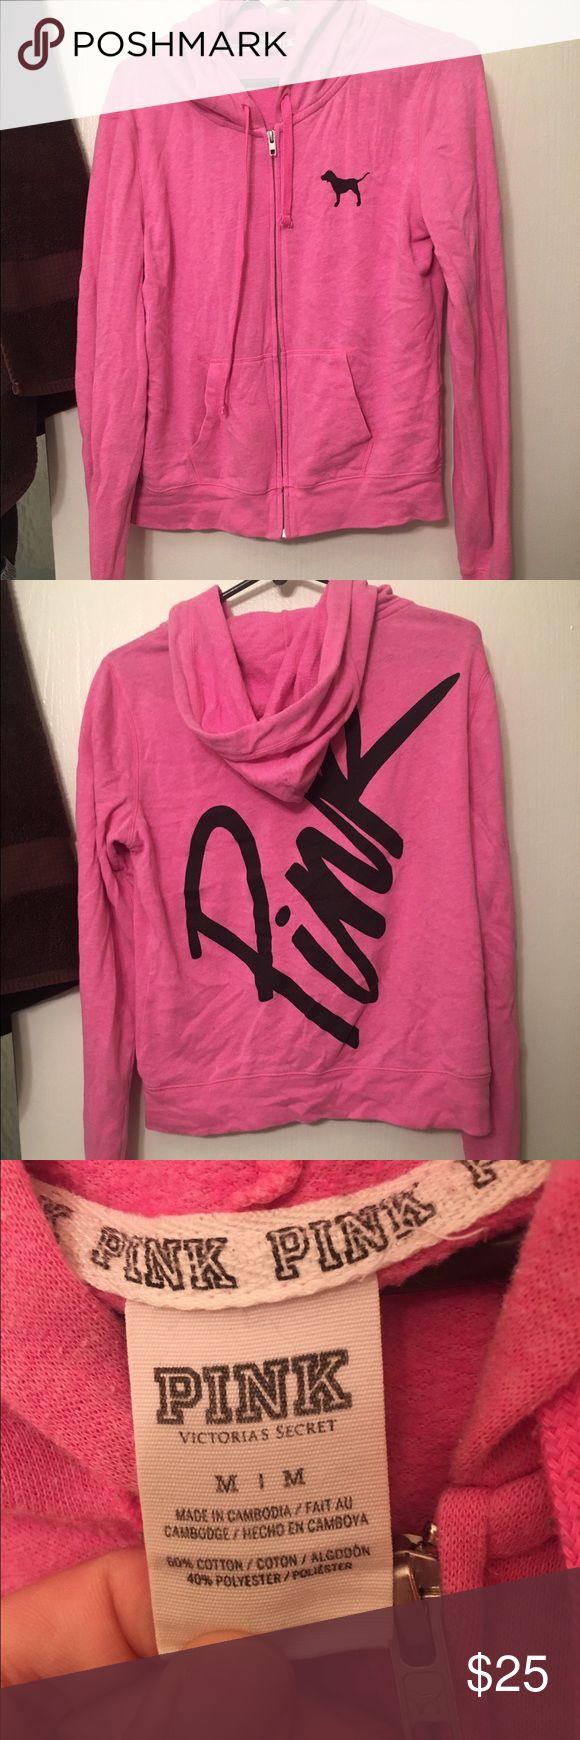 Victoria secret pink zip up hoodie Lightly worn Pink hoodie. No flaws, just too short for my torso. Cute and comfy! PINK Victoria's Secret Tops Sweatshirts & Hoodies